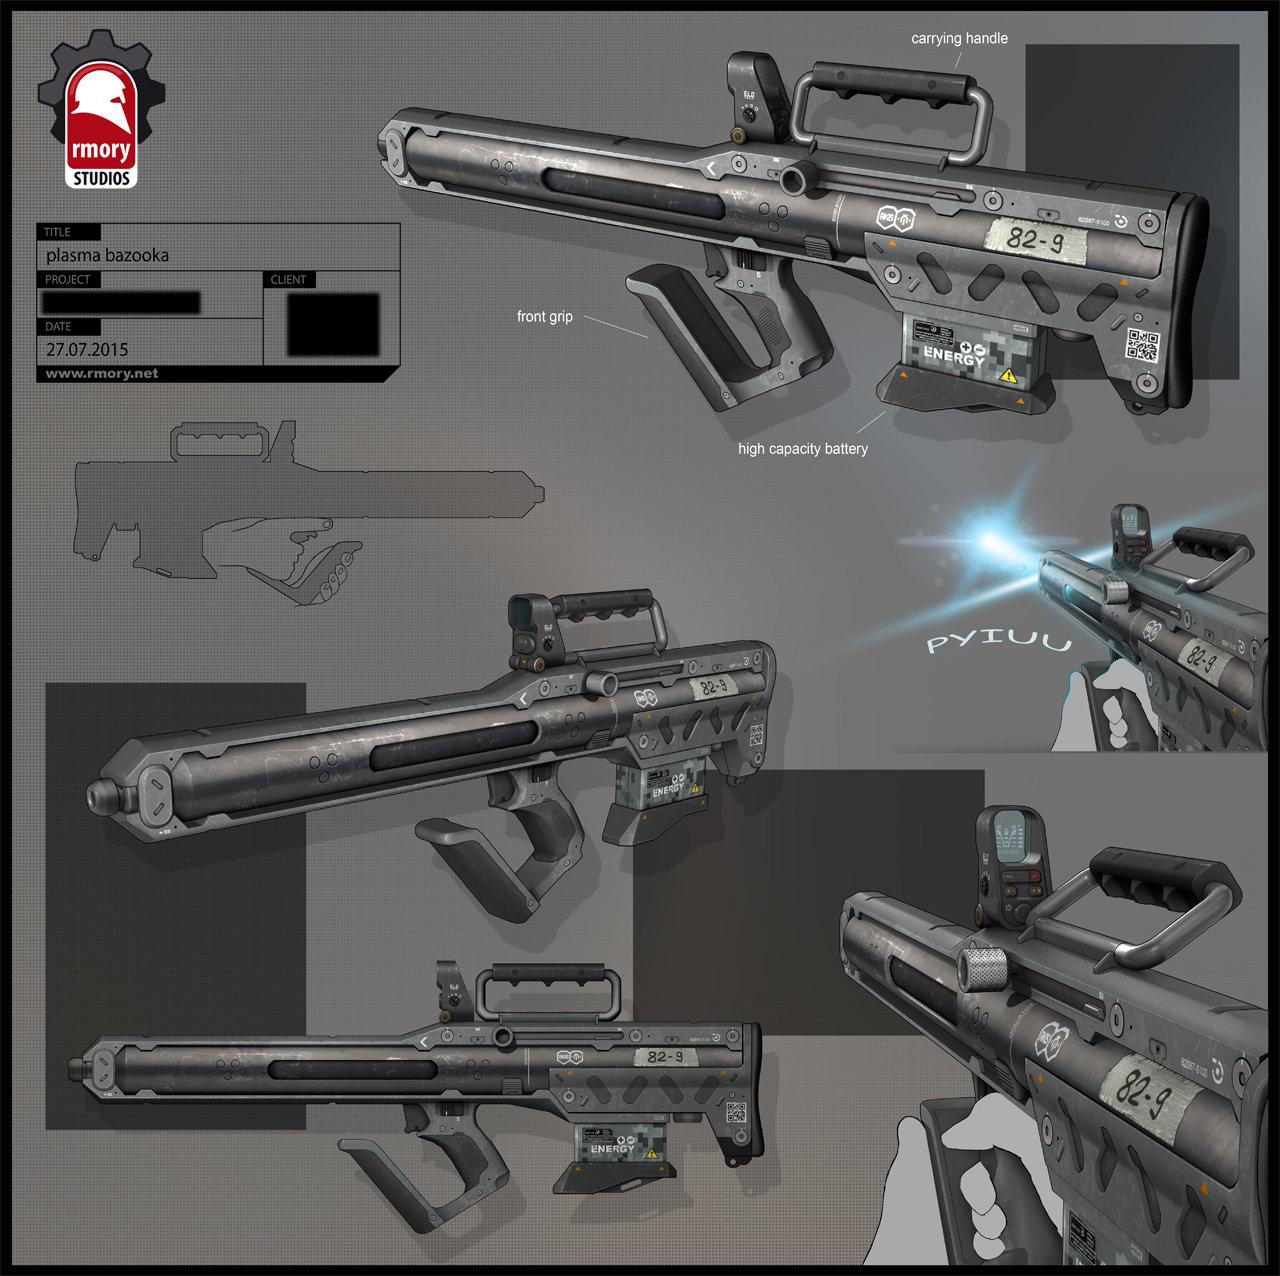 plasma bazooka - rmory studios